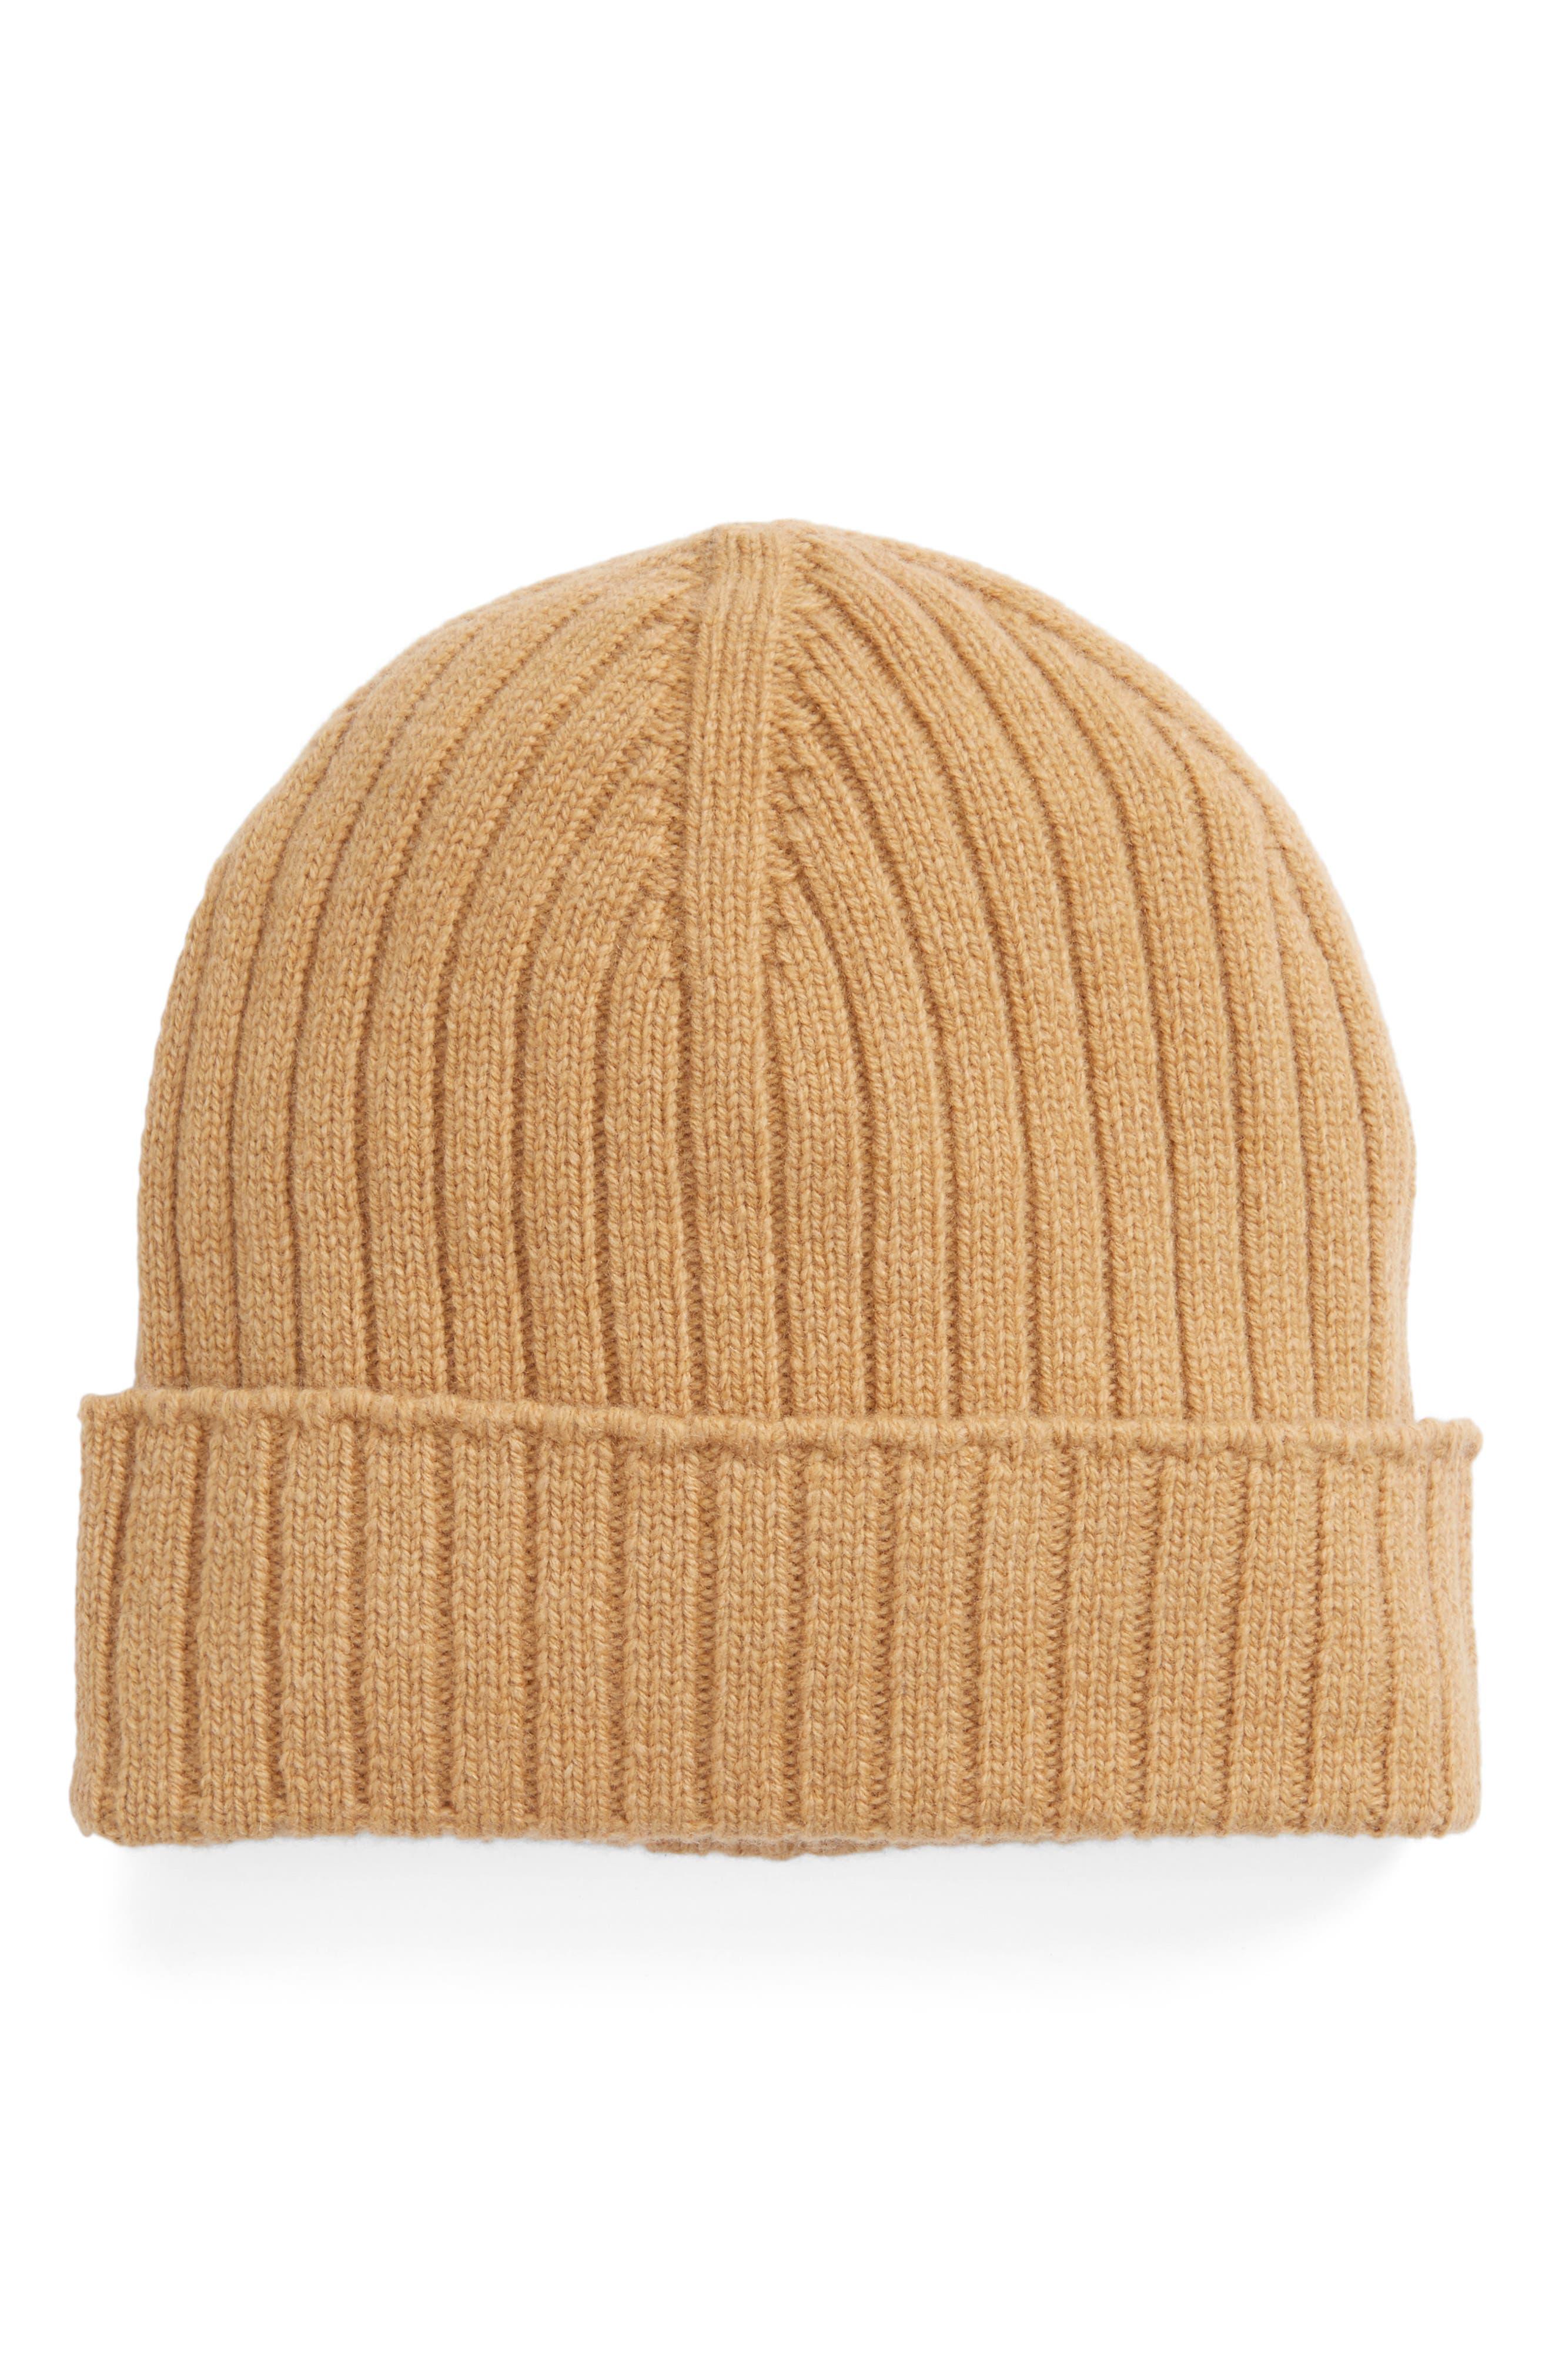 Wool Knit Cap,                             Main thumbnail 2, color,